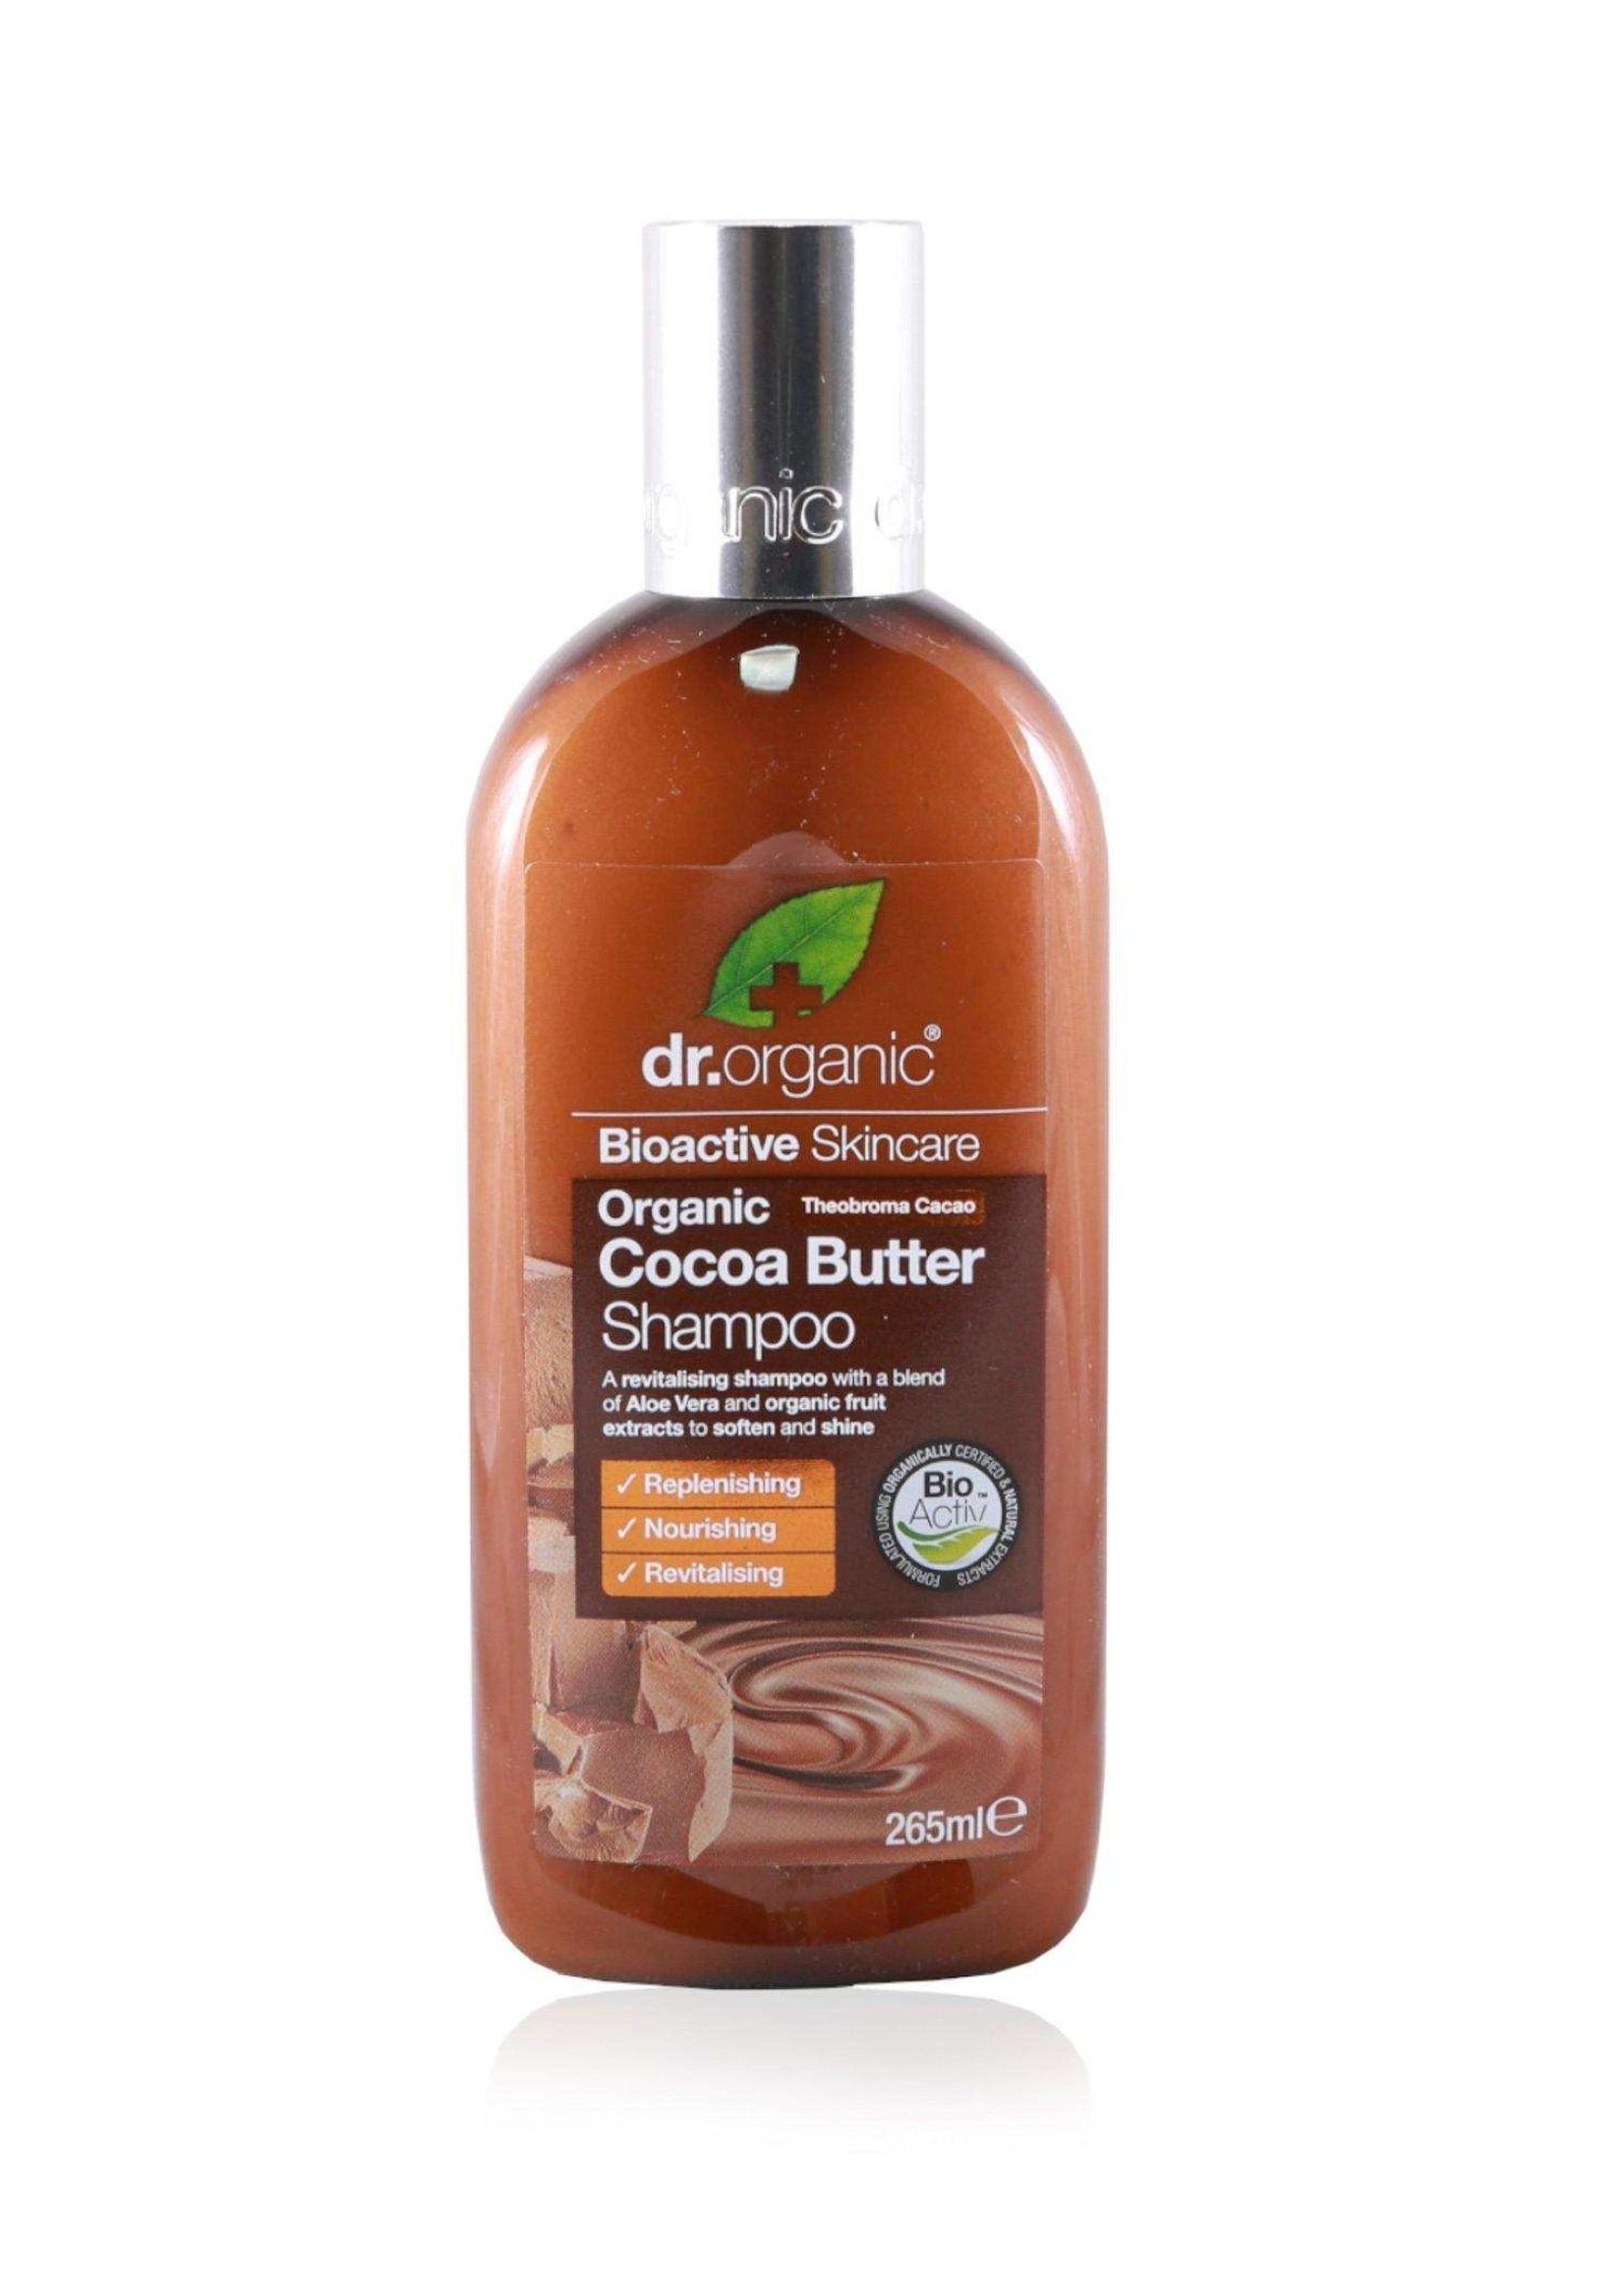 Dr Organic Dr Organic Shampoo Organic Cocoa Butter 265ml